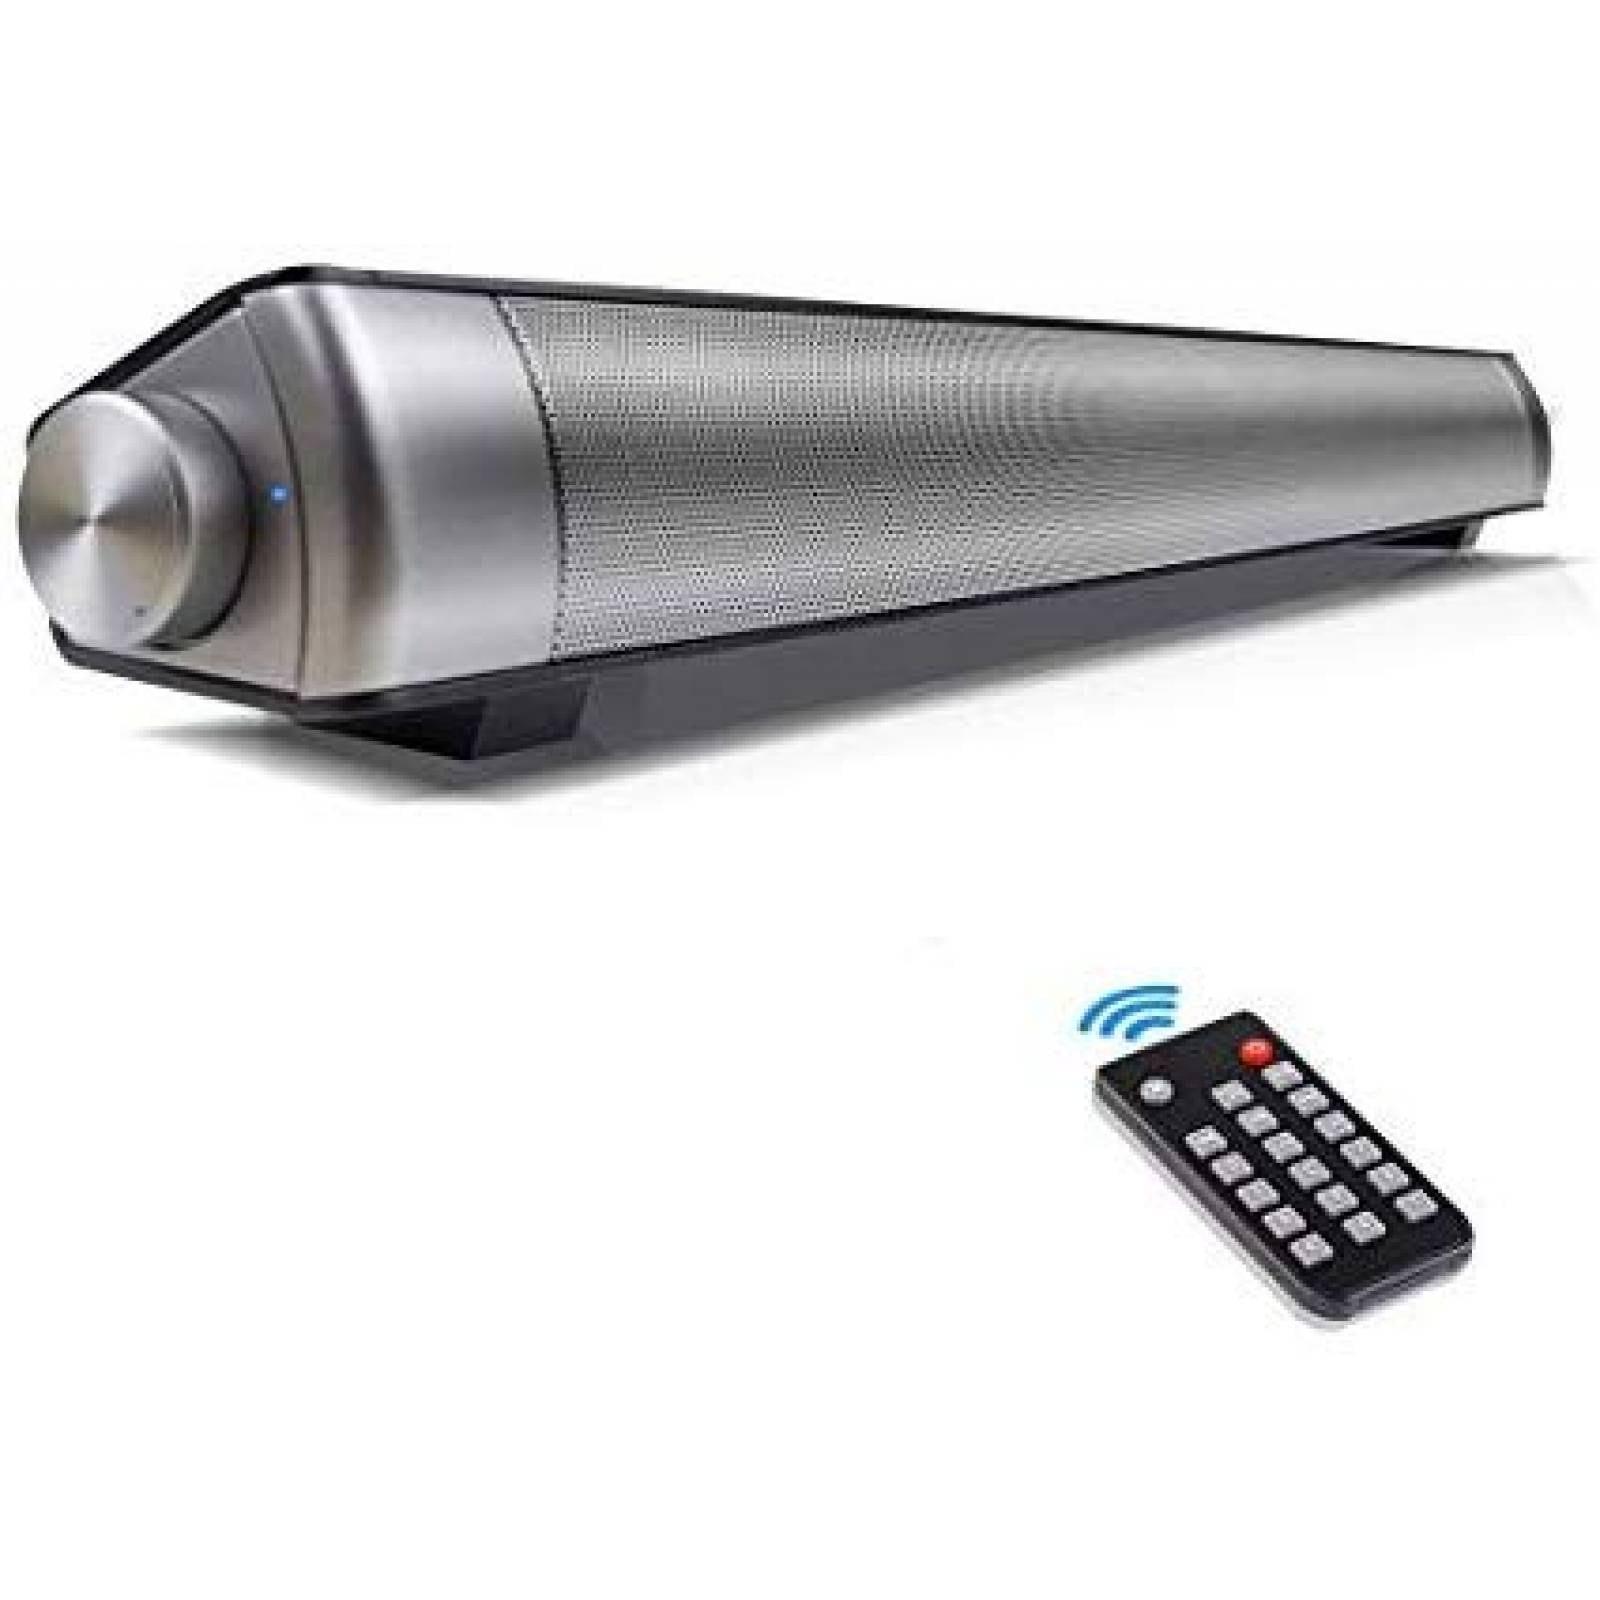 Barra de Sonido AGKupel p/ TV Subwoofer Bluetooth Sonido 3D